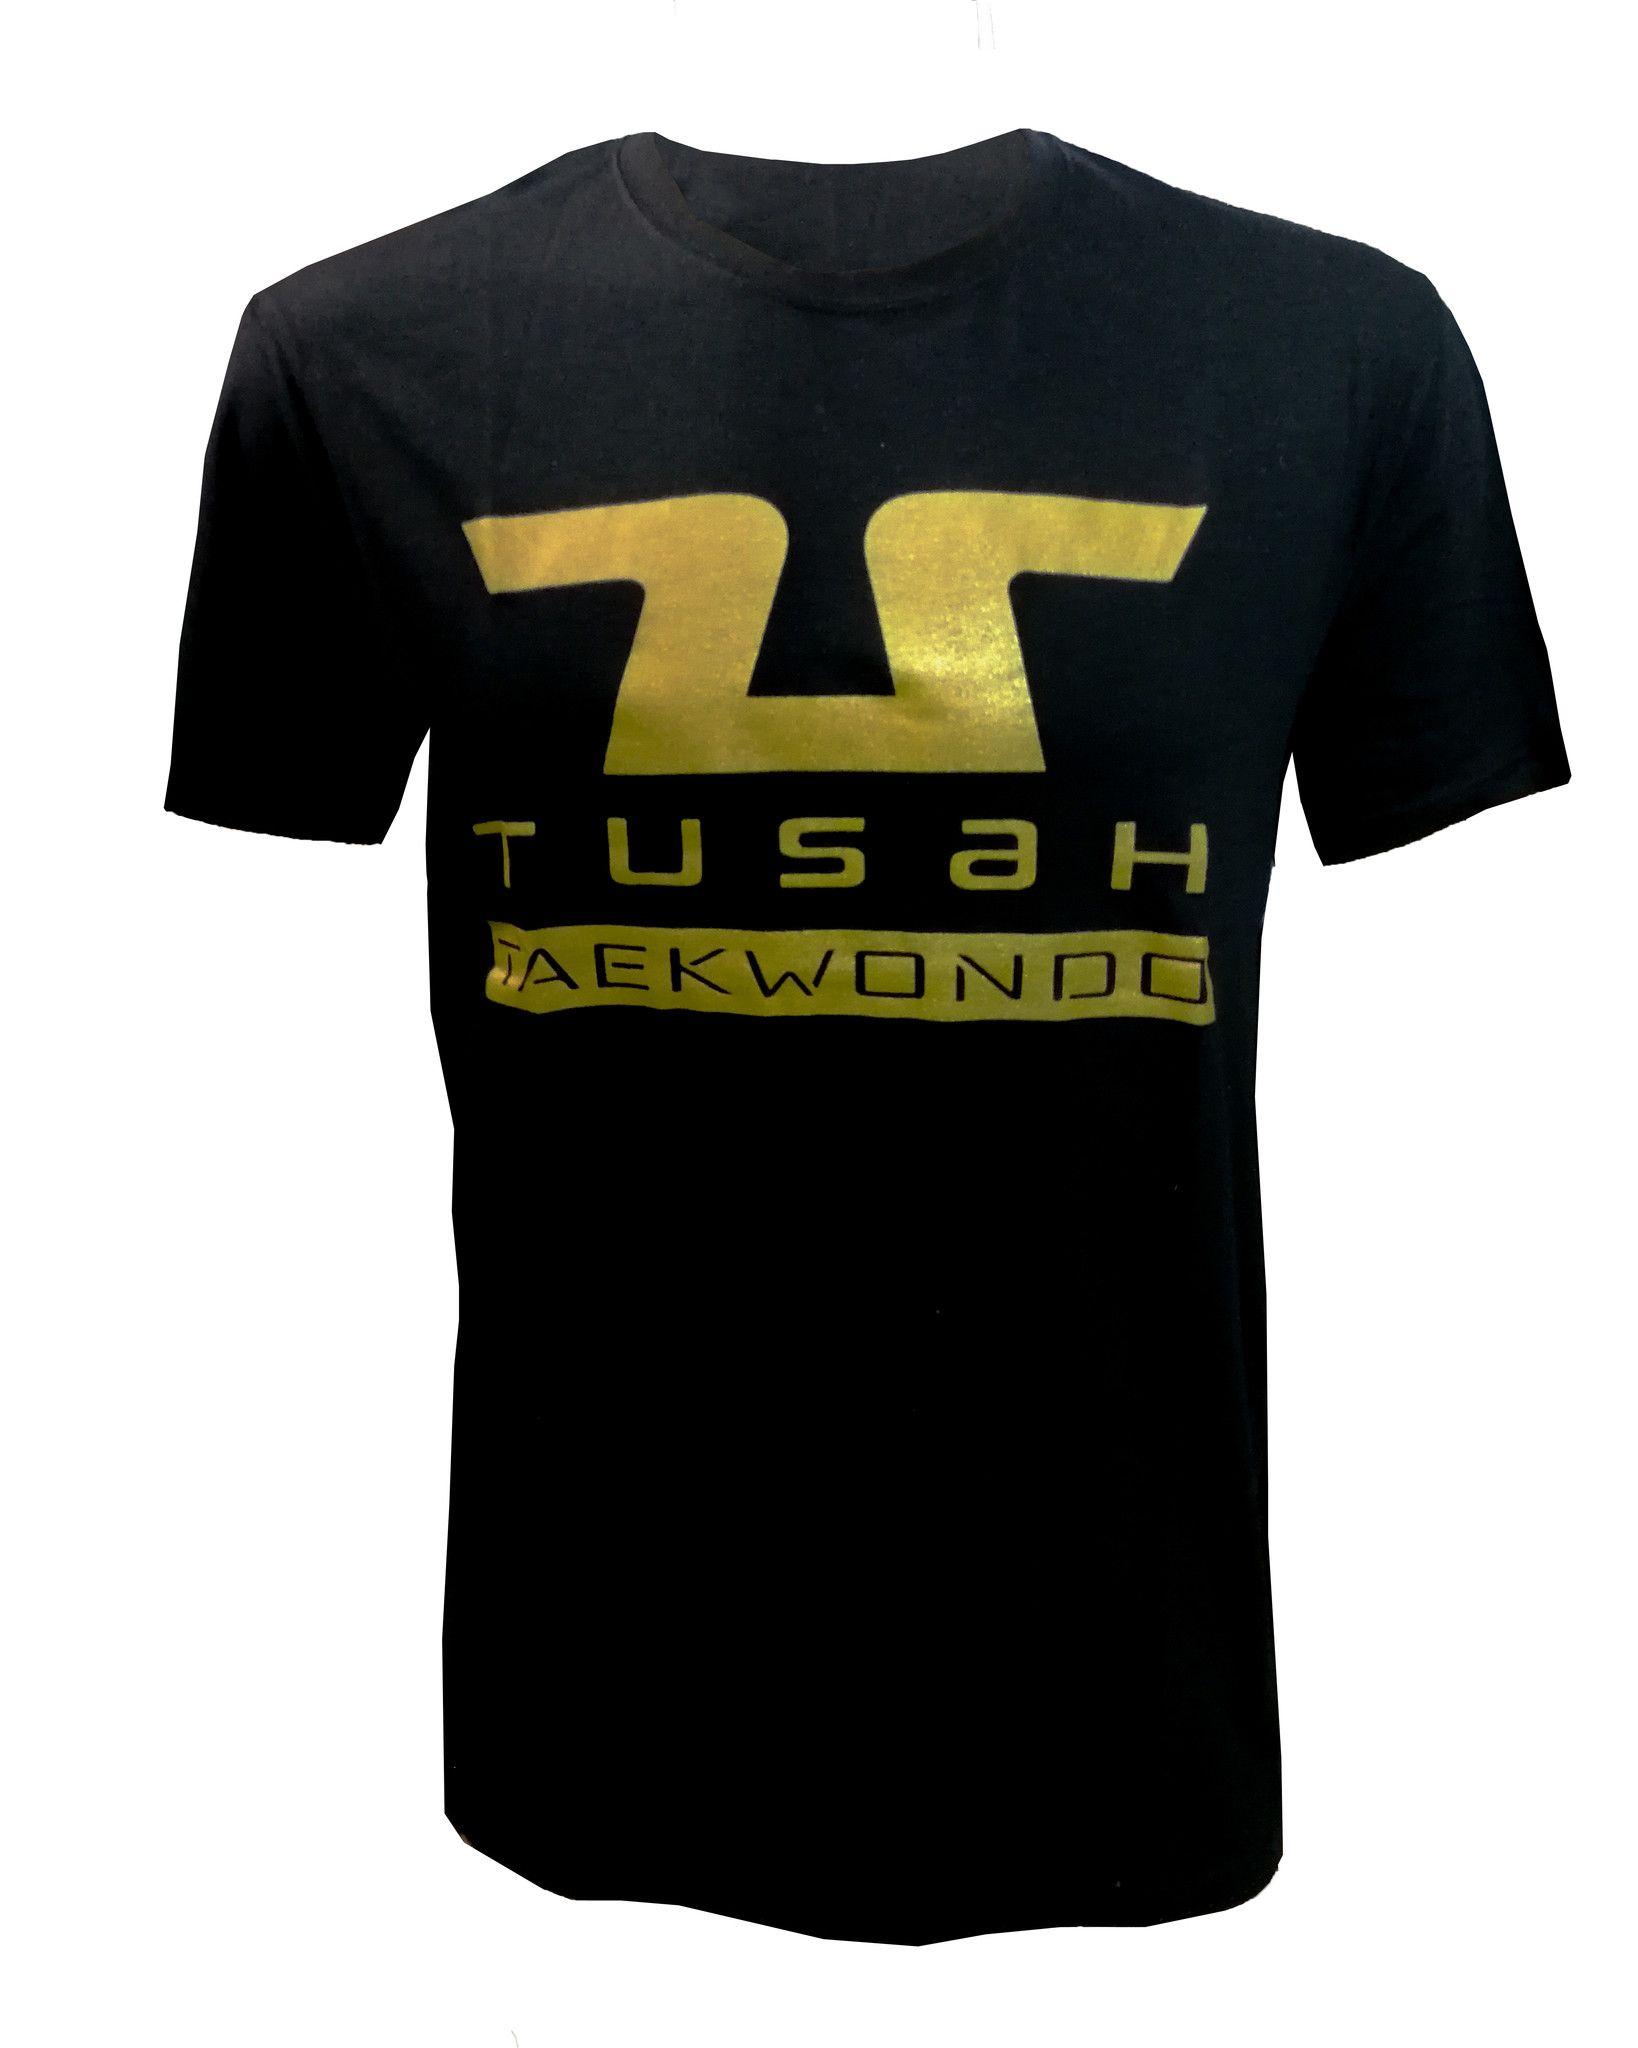 T-Shirt Taekwondo Tusah Gold Nera 100% Cotone WT WTF